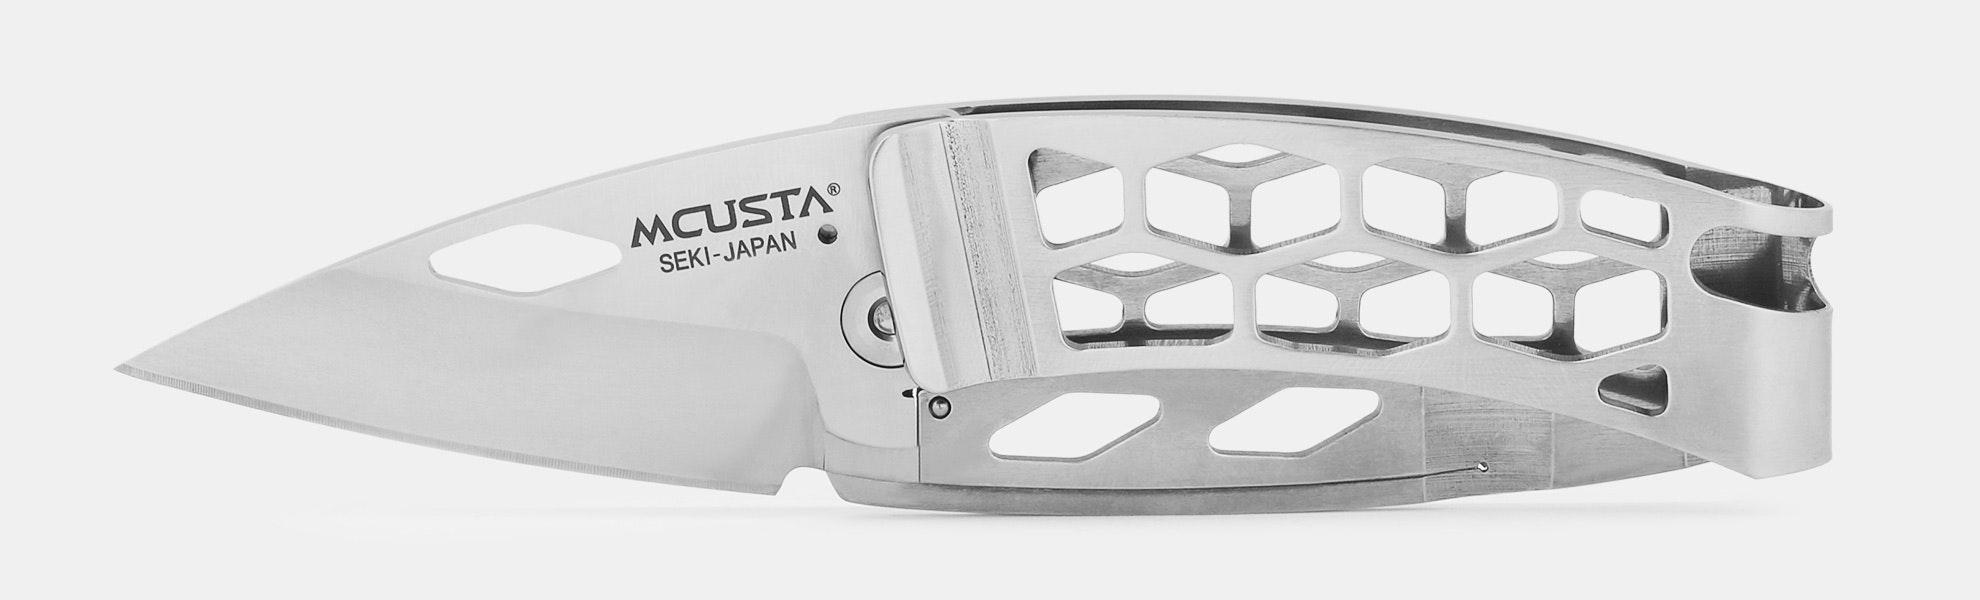 Mcusta Limited-Edition Money Clip Knife